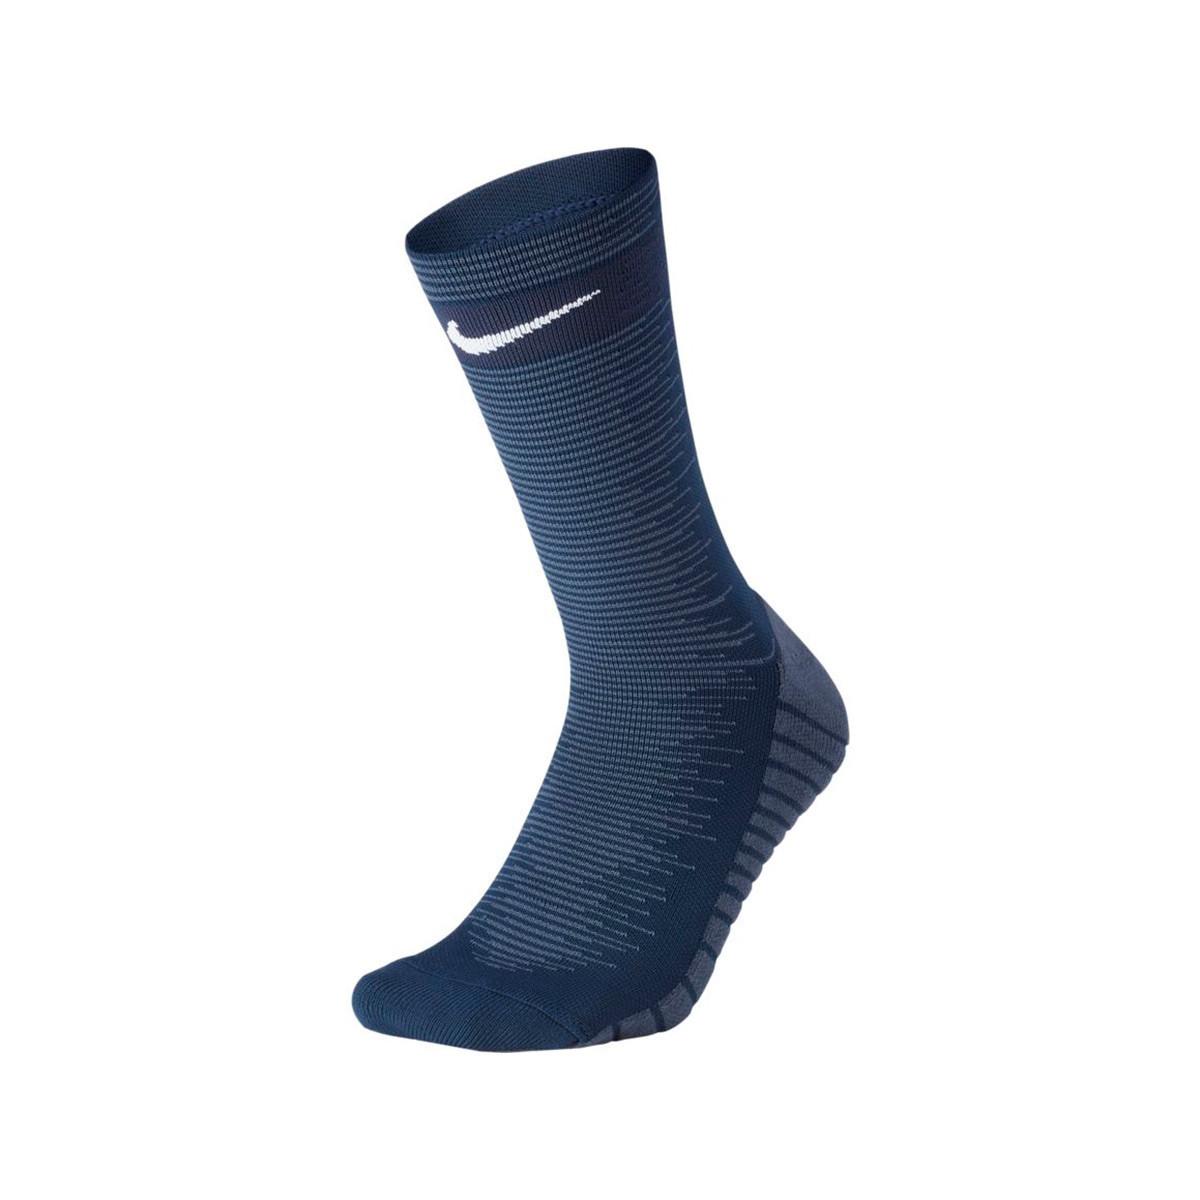 buscar original Tener cuidado de selección mundial de Socks Nike Squad Crew Midnight navy-White - Football store Fútbol ...